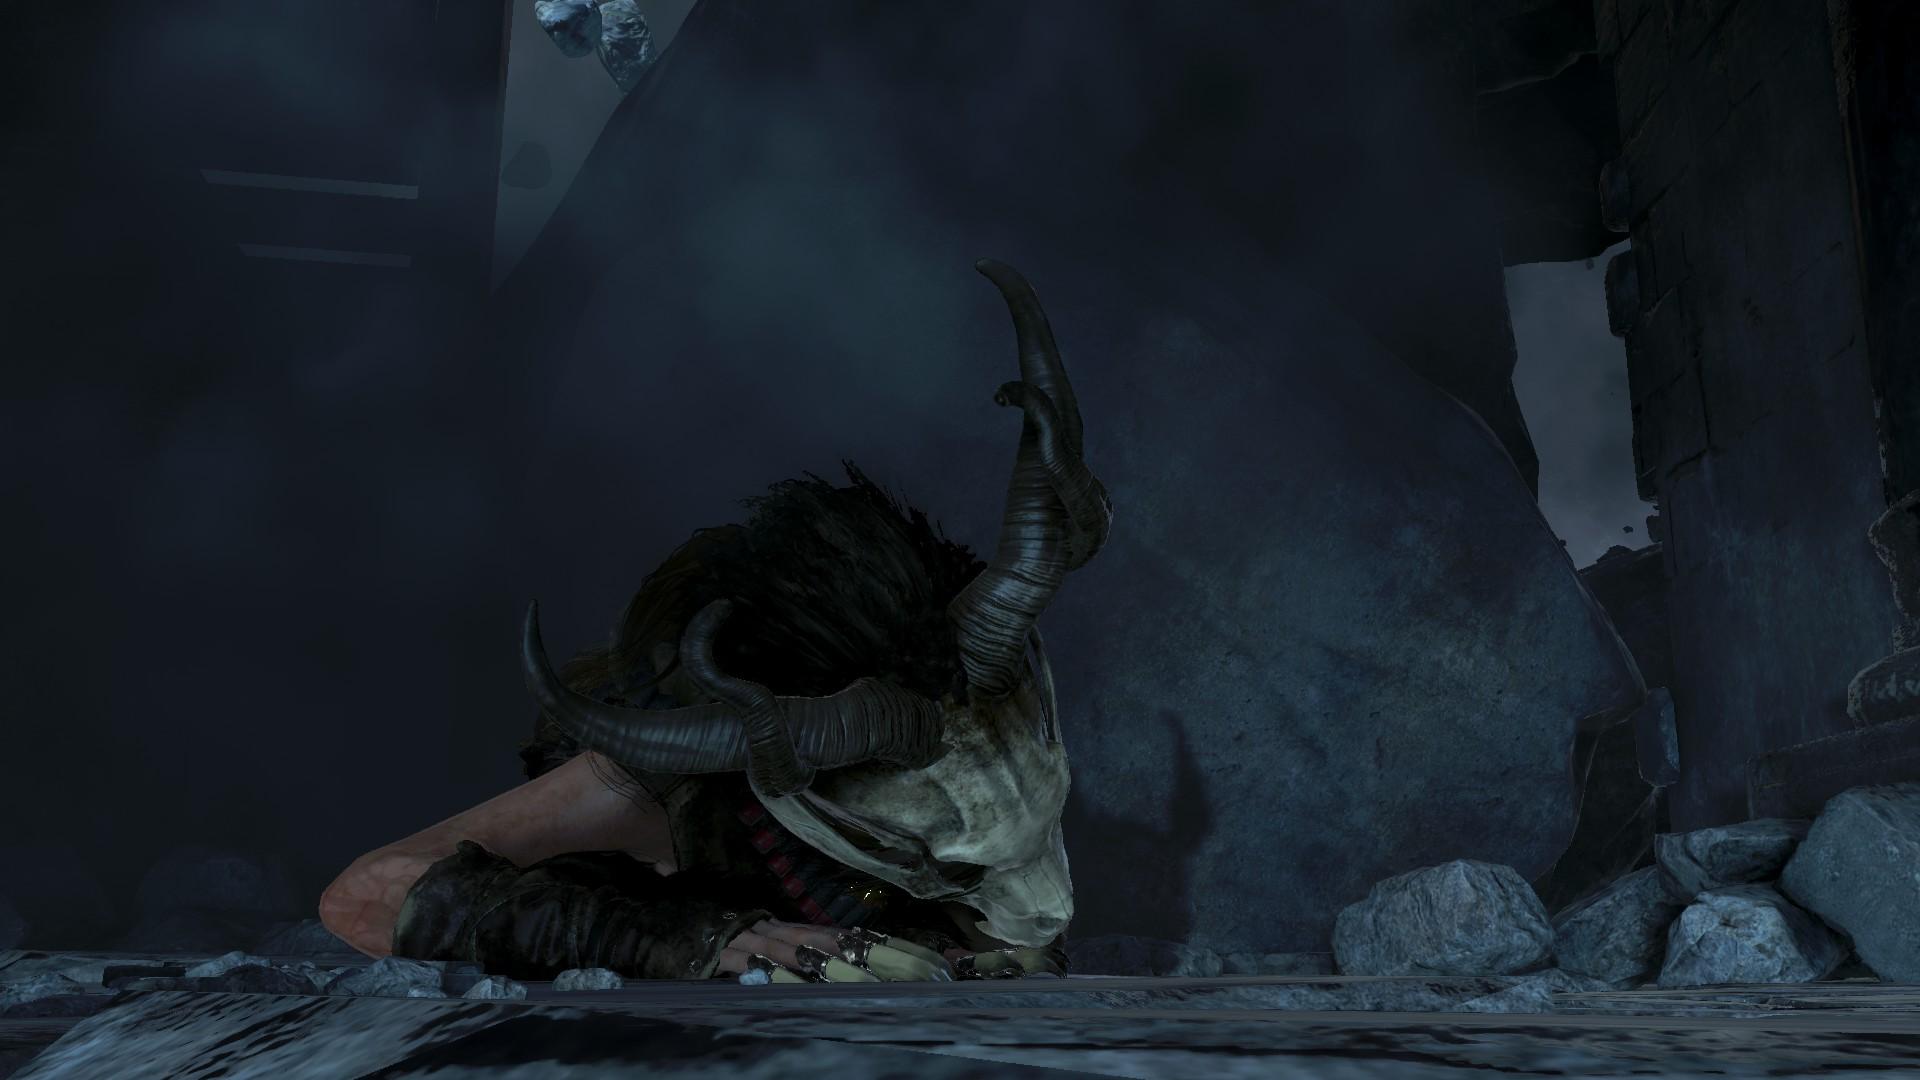 20171217160253_1.jpg - Rise of the Tomb Raider